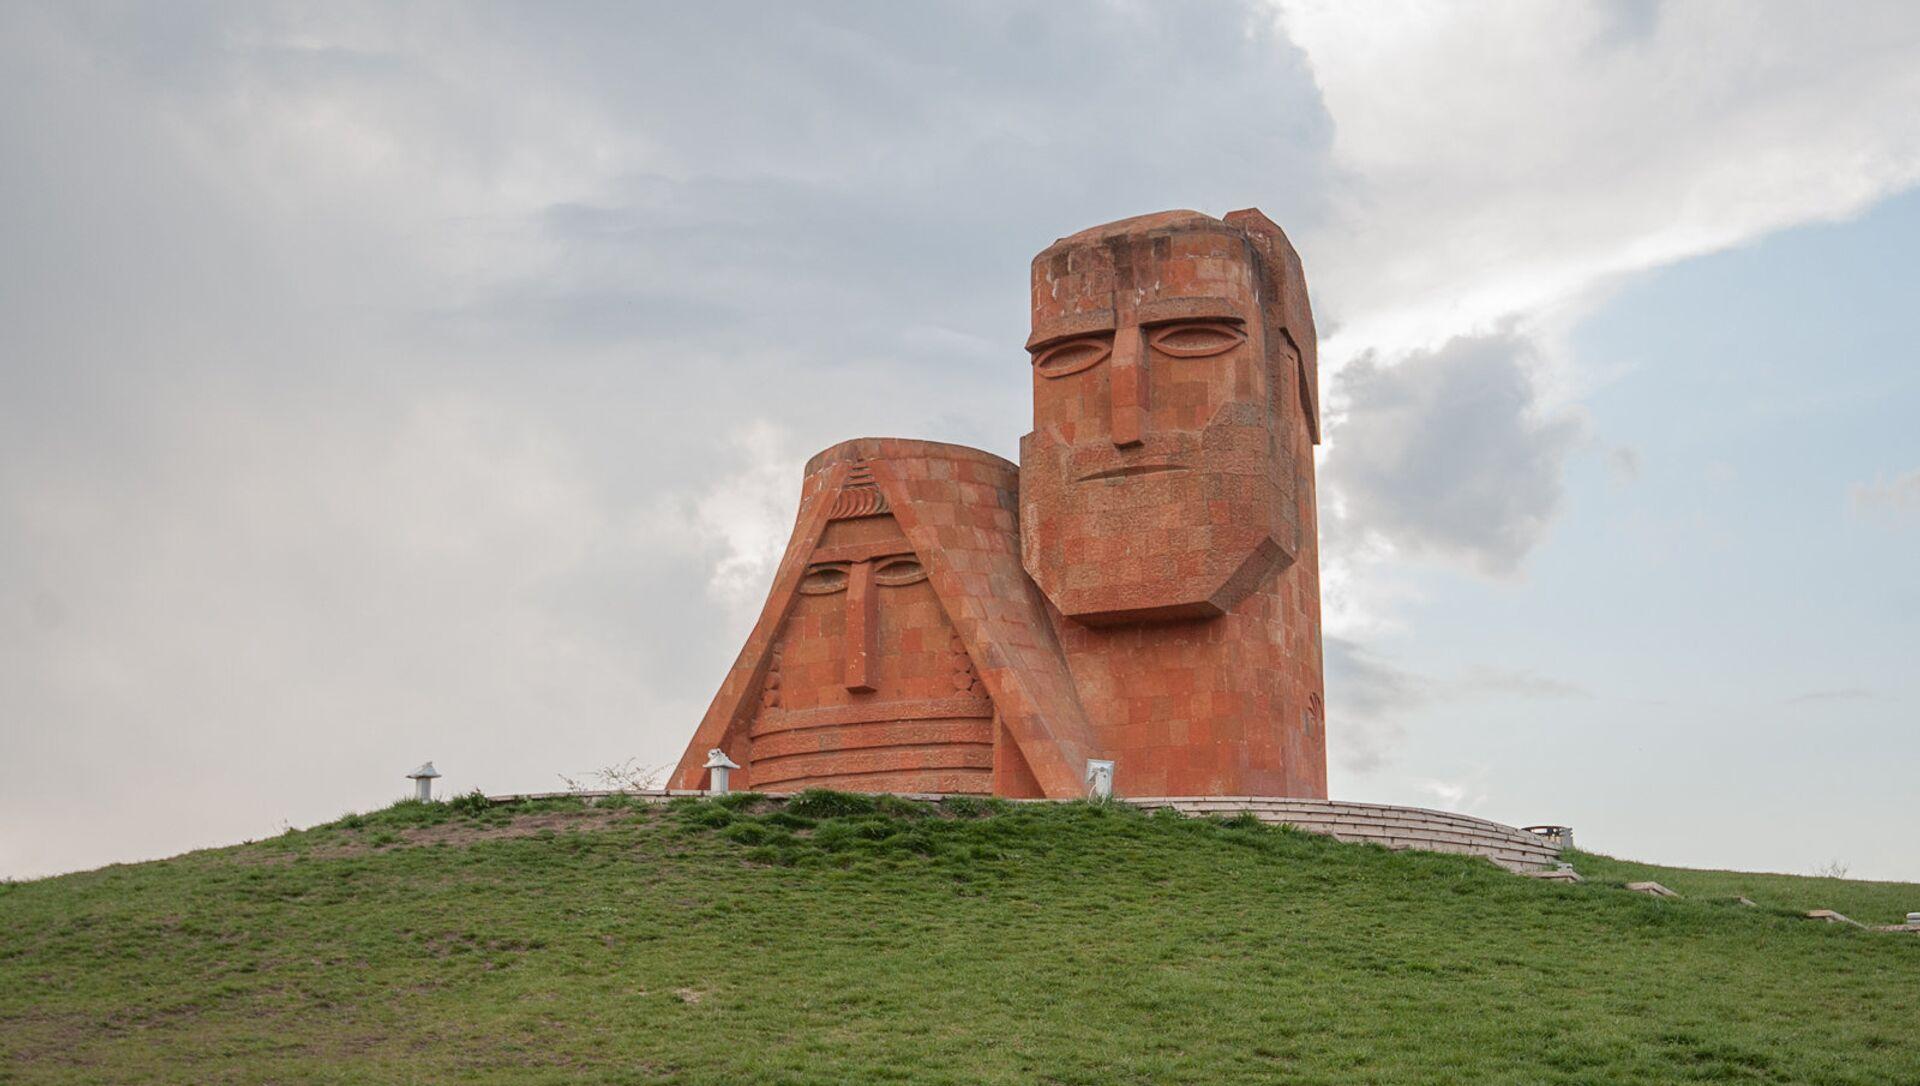 Памятник Мы-наши горы. Степанакерт. НКР - Sputnik Արմենիա, 1920, 31.08.2021